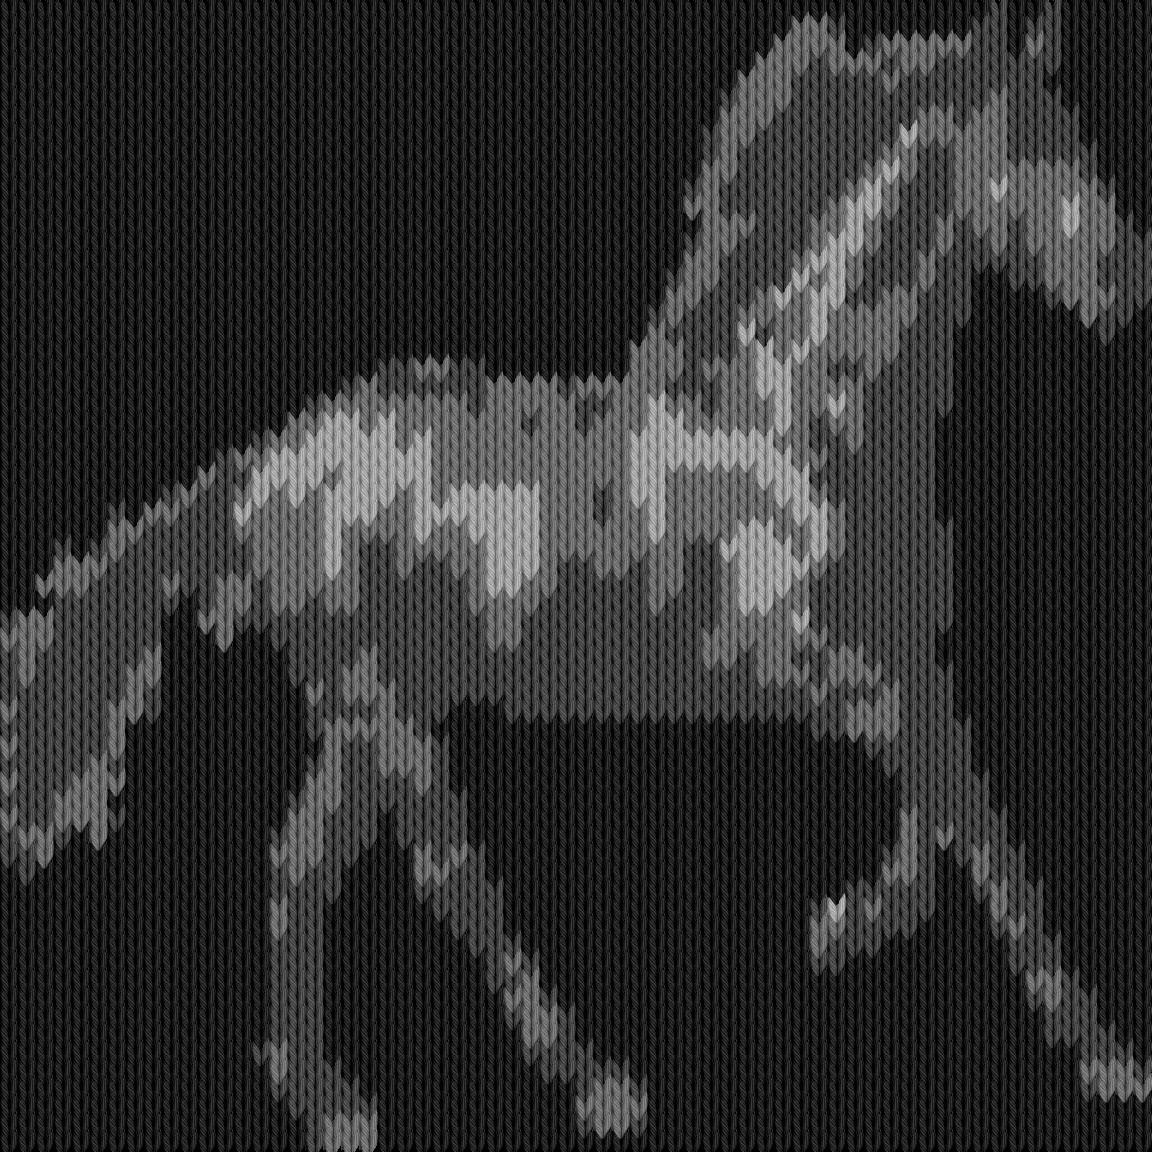 Knitting motif chart, horse